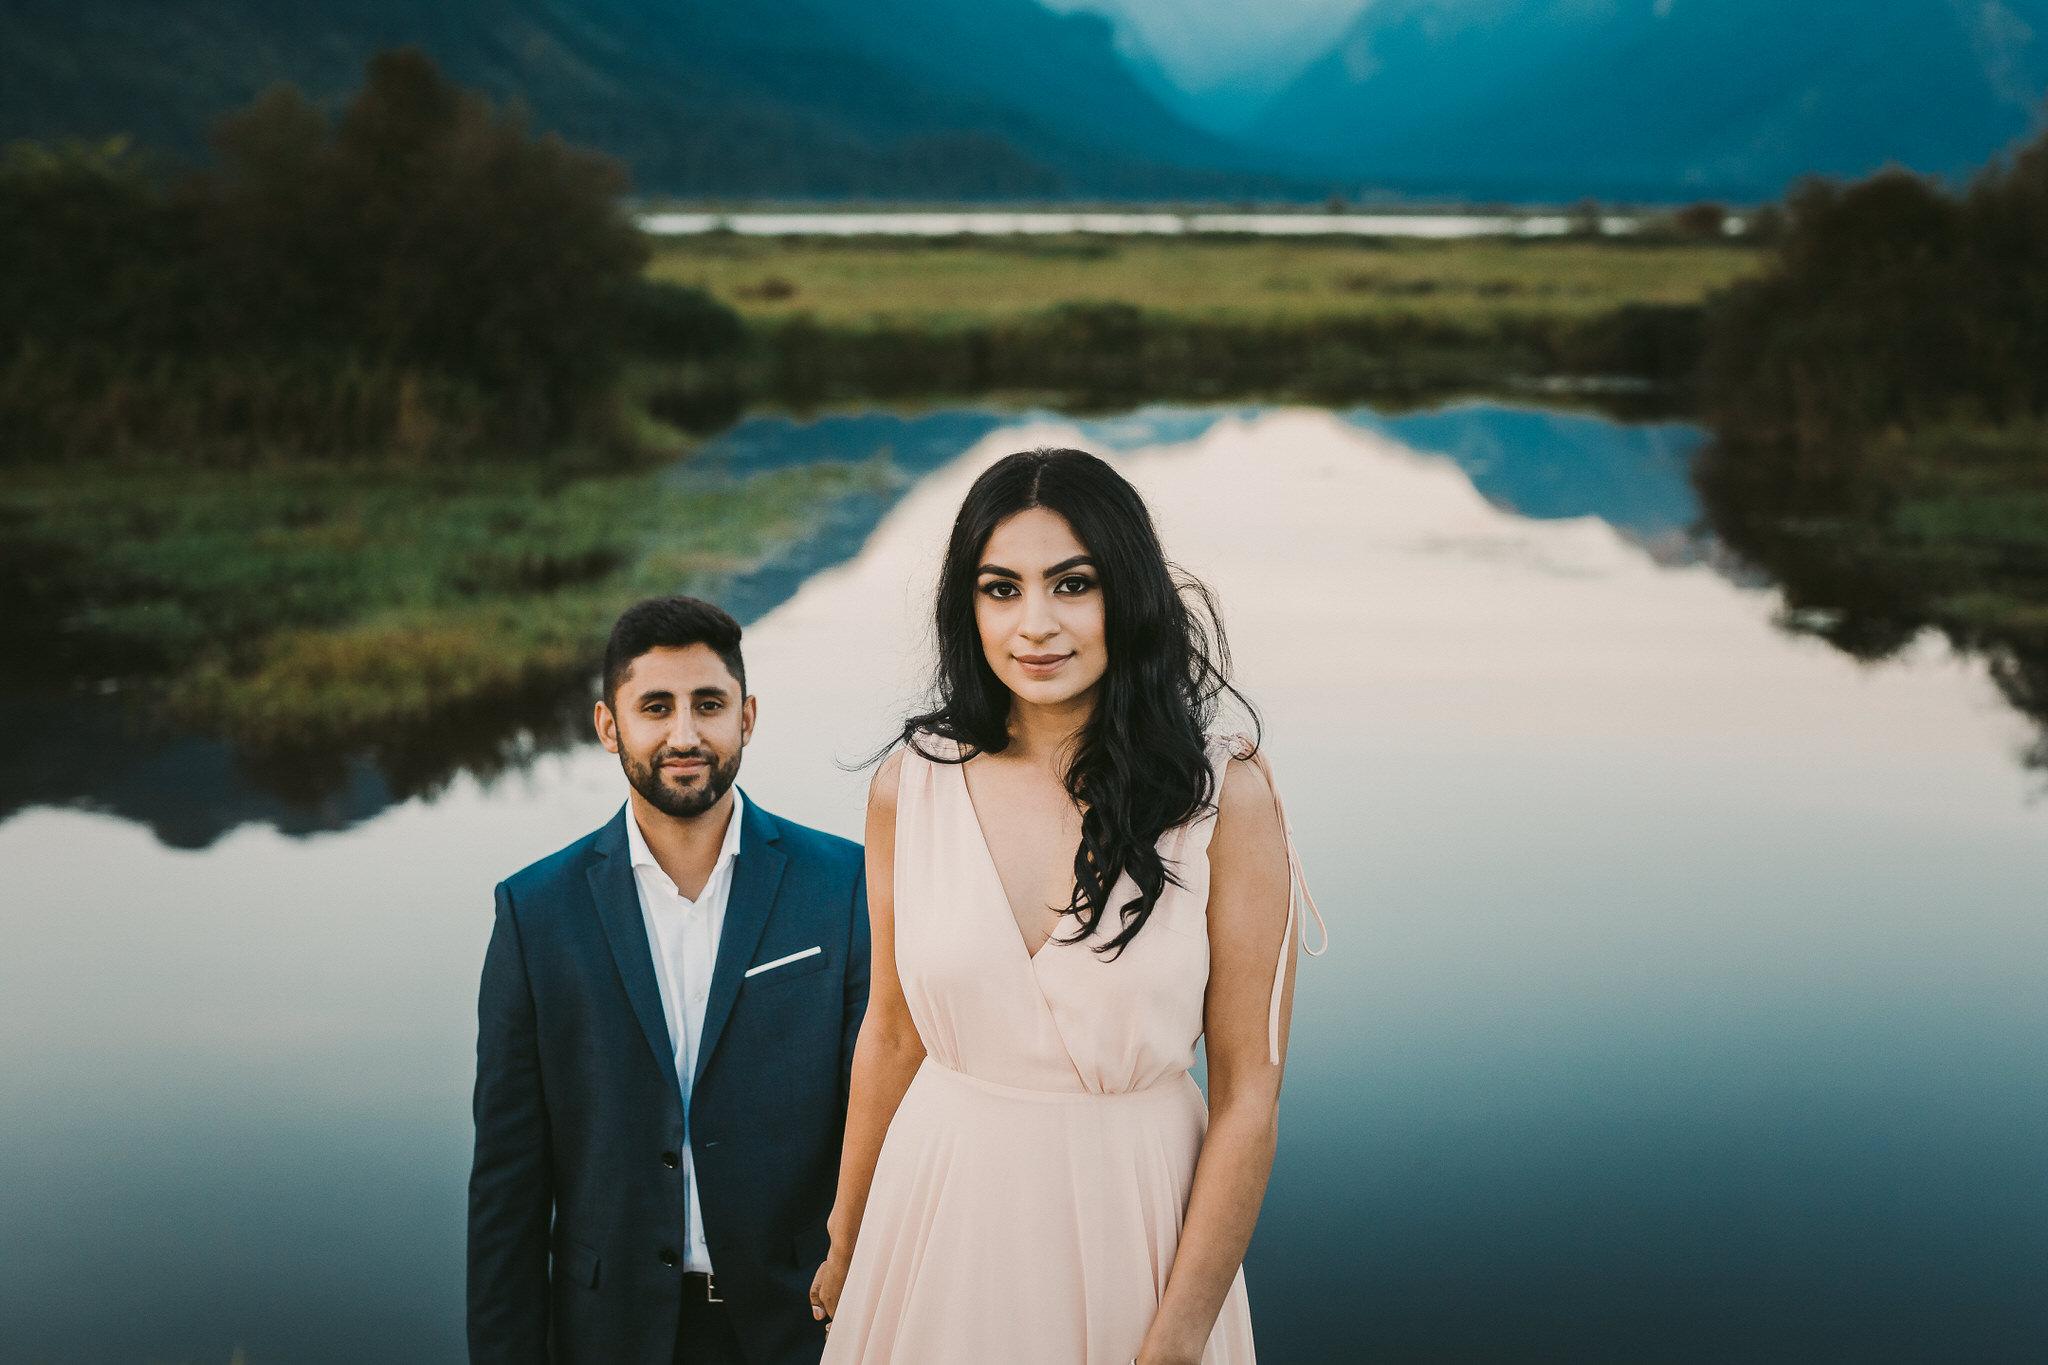 Maple-Ridge-Vancouver-Chilliwack-Engagement-Wedding-Photographer-9.jpg